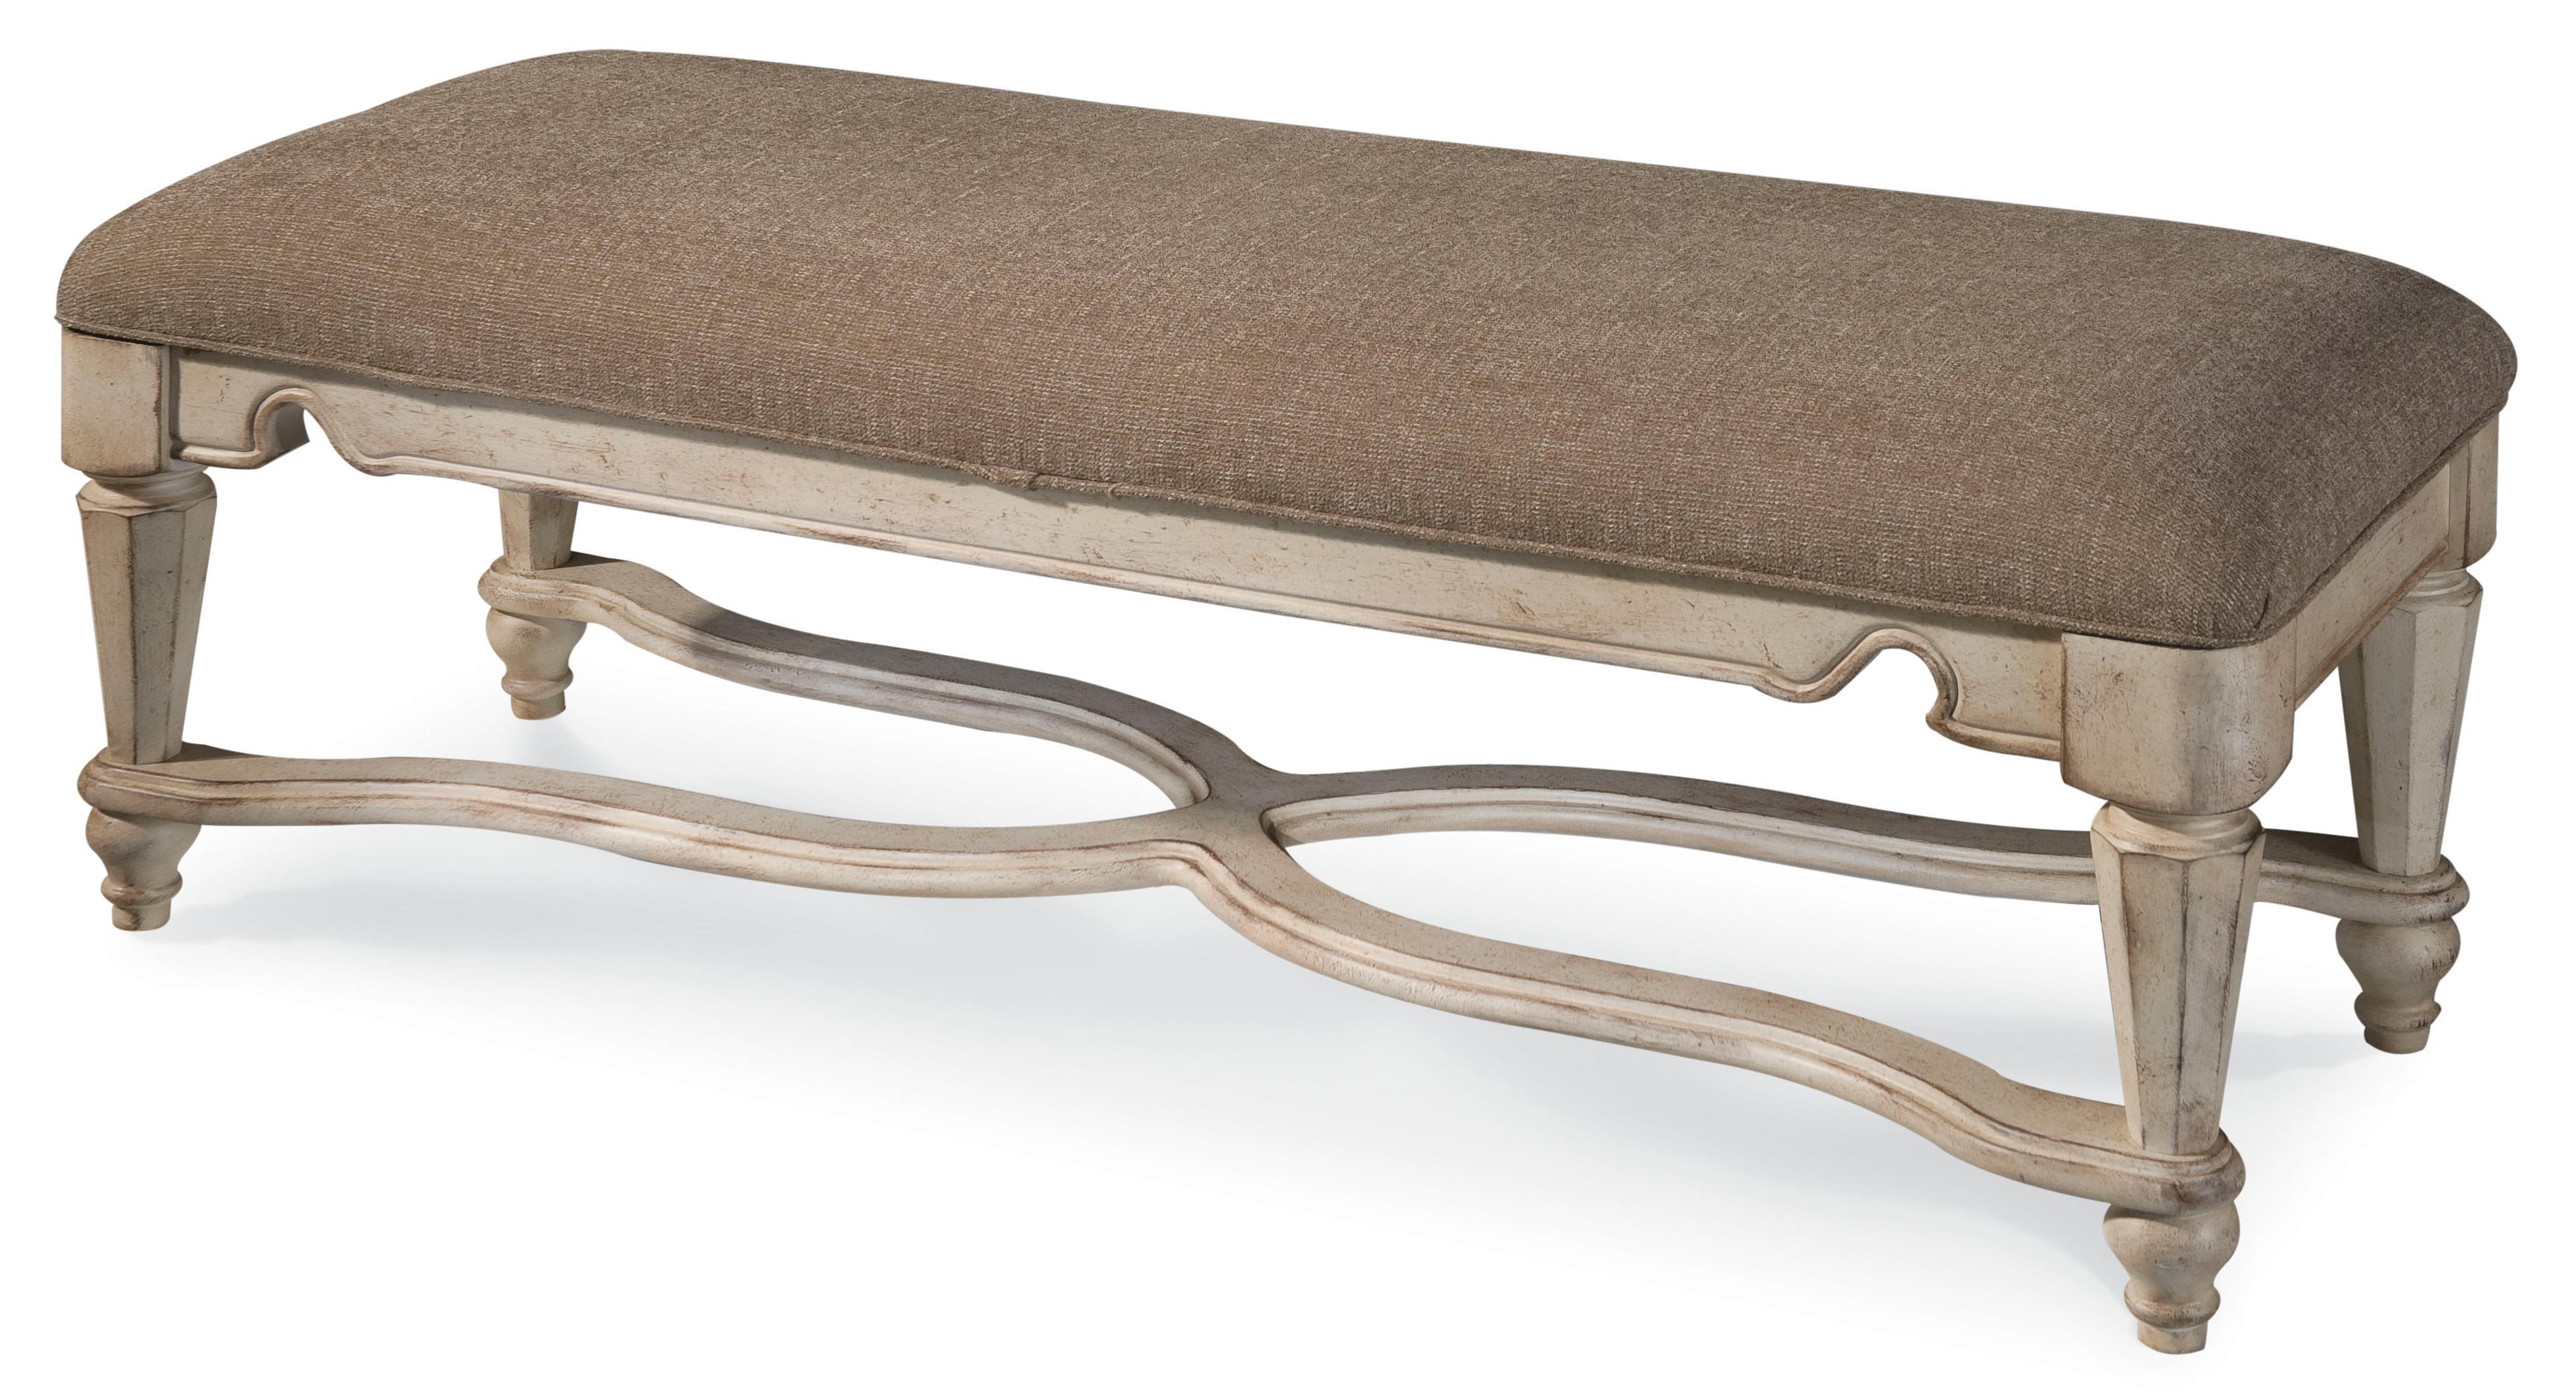 A.R.T. Furniture Inc Belmar II Bench - Item Number: 189149-2617